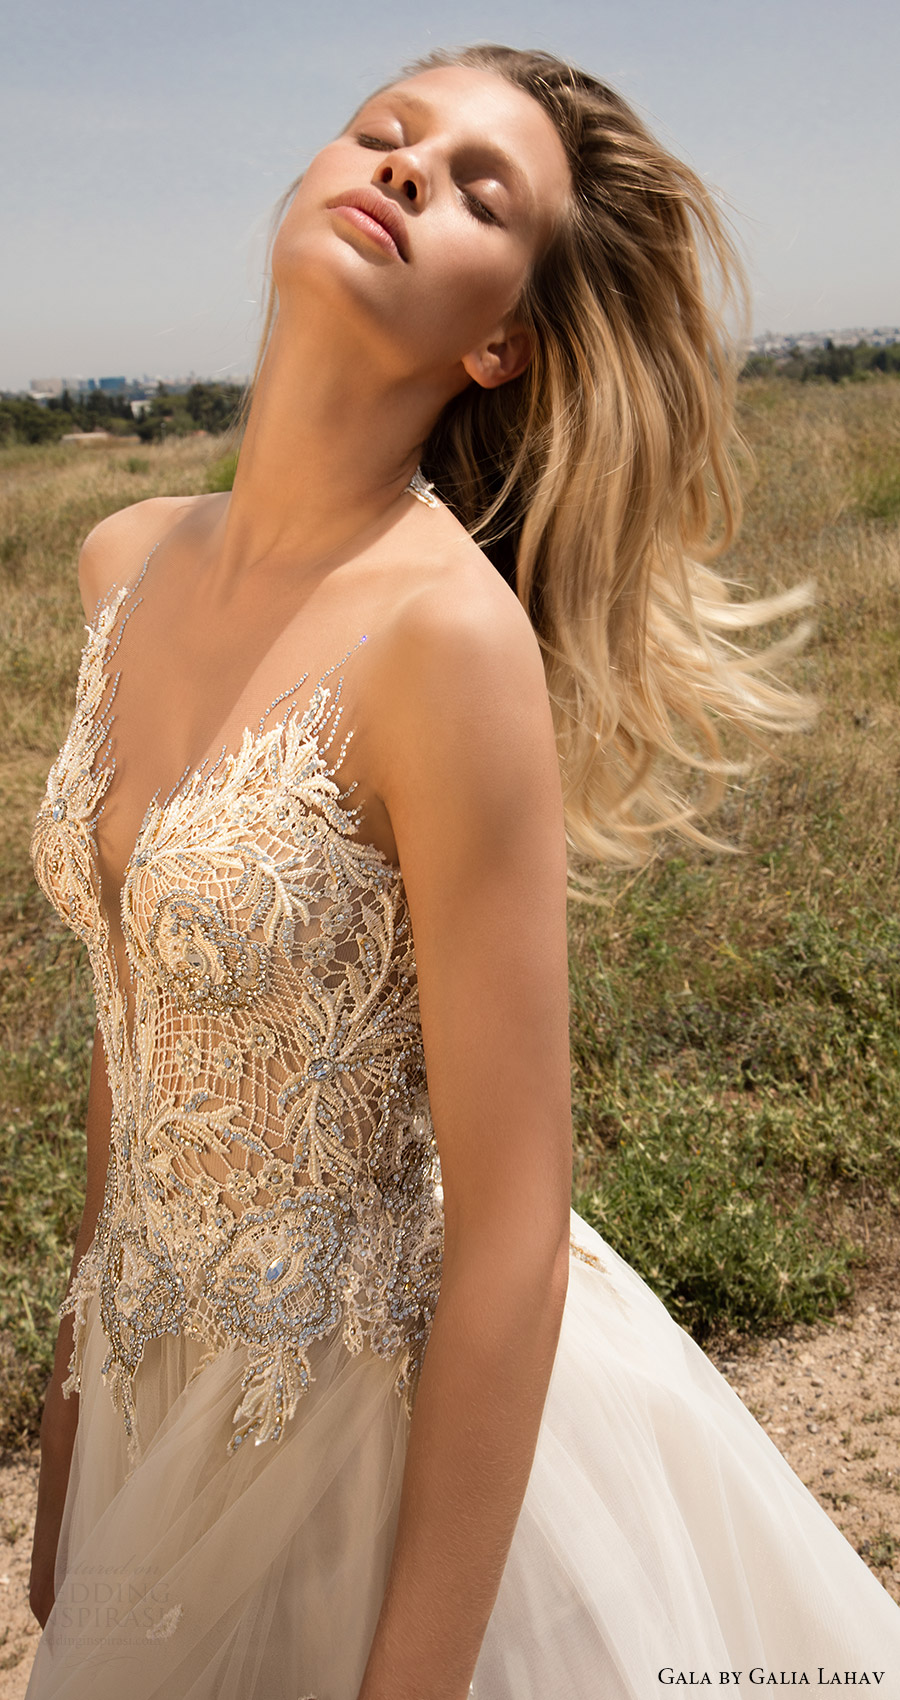 primavera Lahav vestido de novia aline gala galia 2017 mangas ilusión embellecido la blusa del amor (706) ZFV